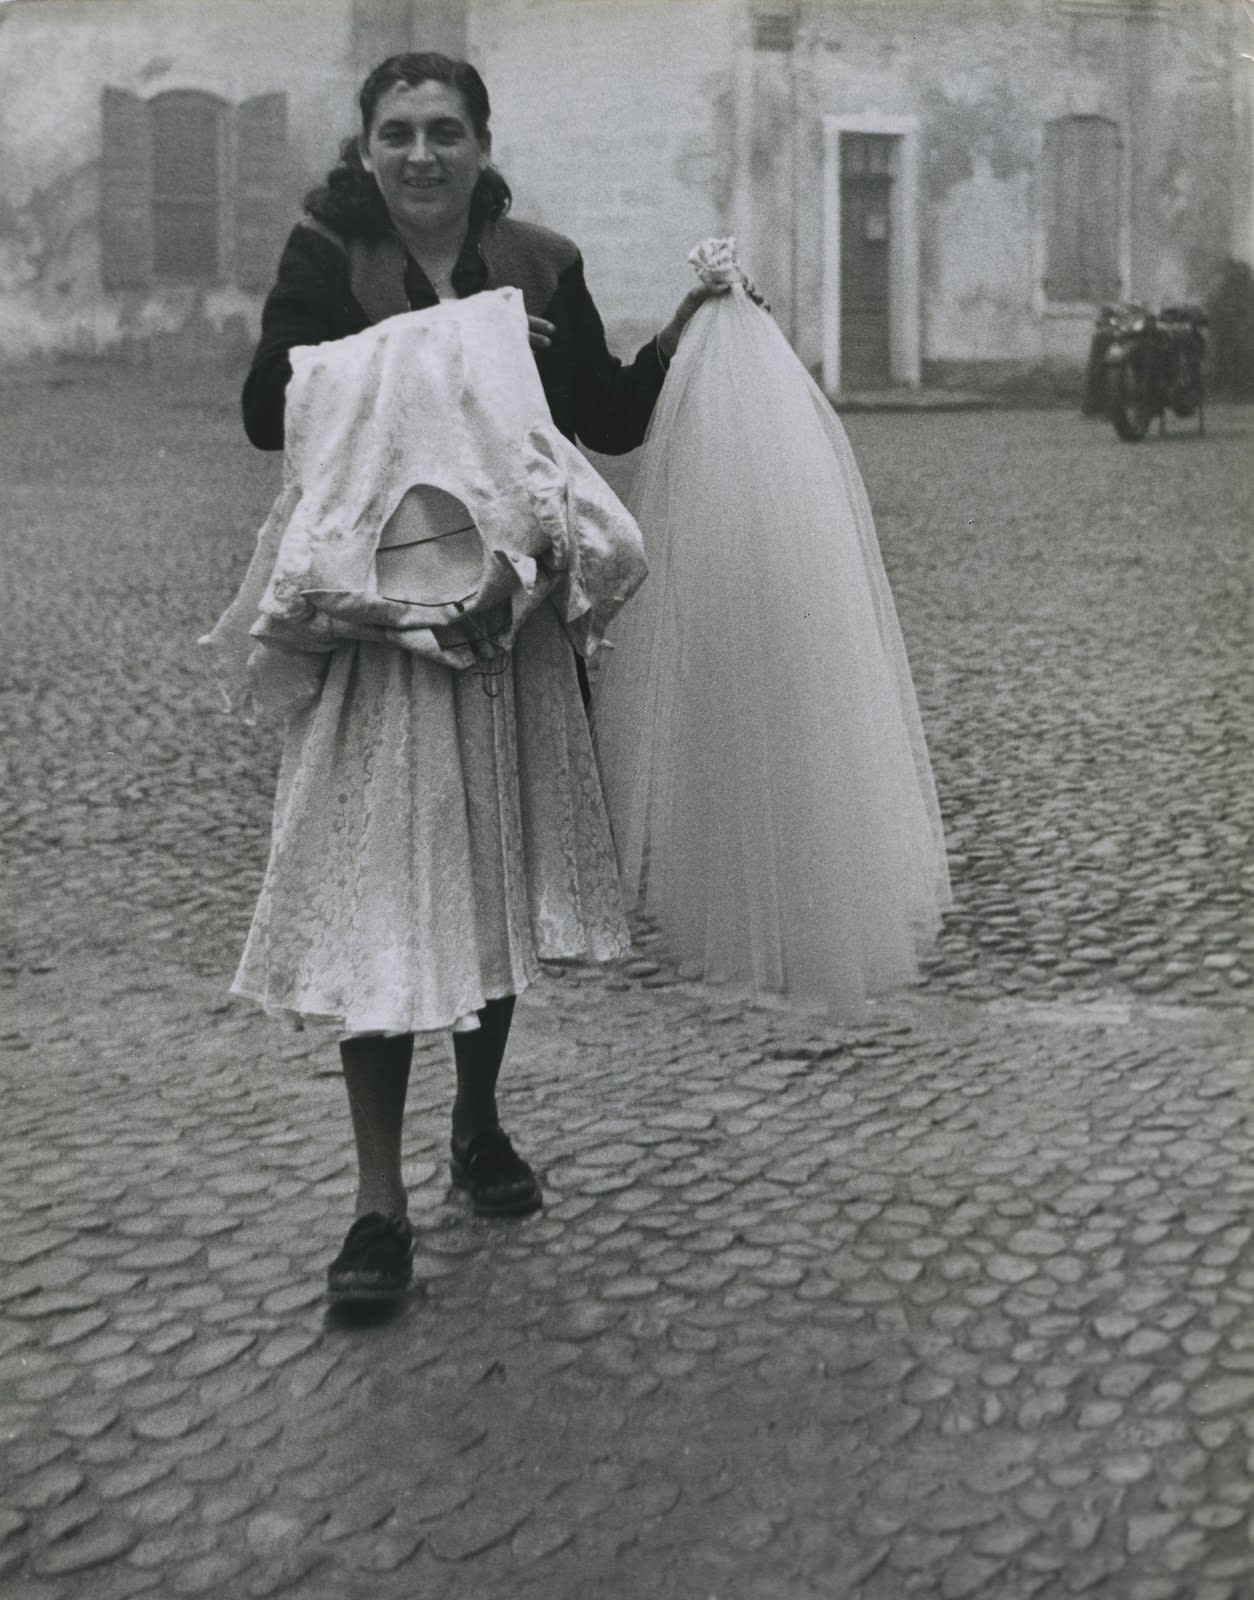 Sabine Weiss, Mariage gitan à Tarascon, 1953